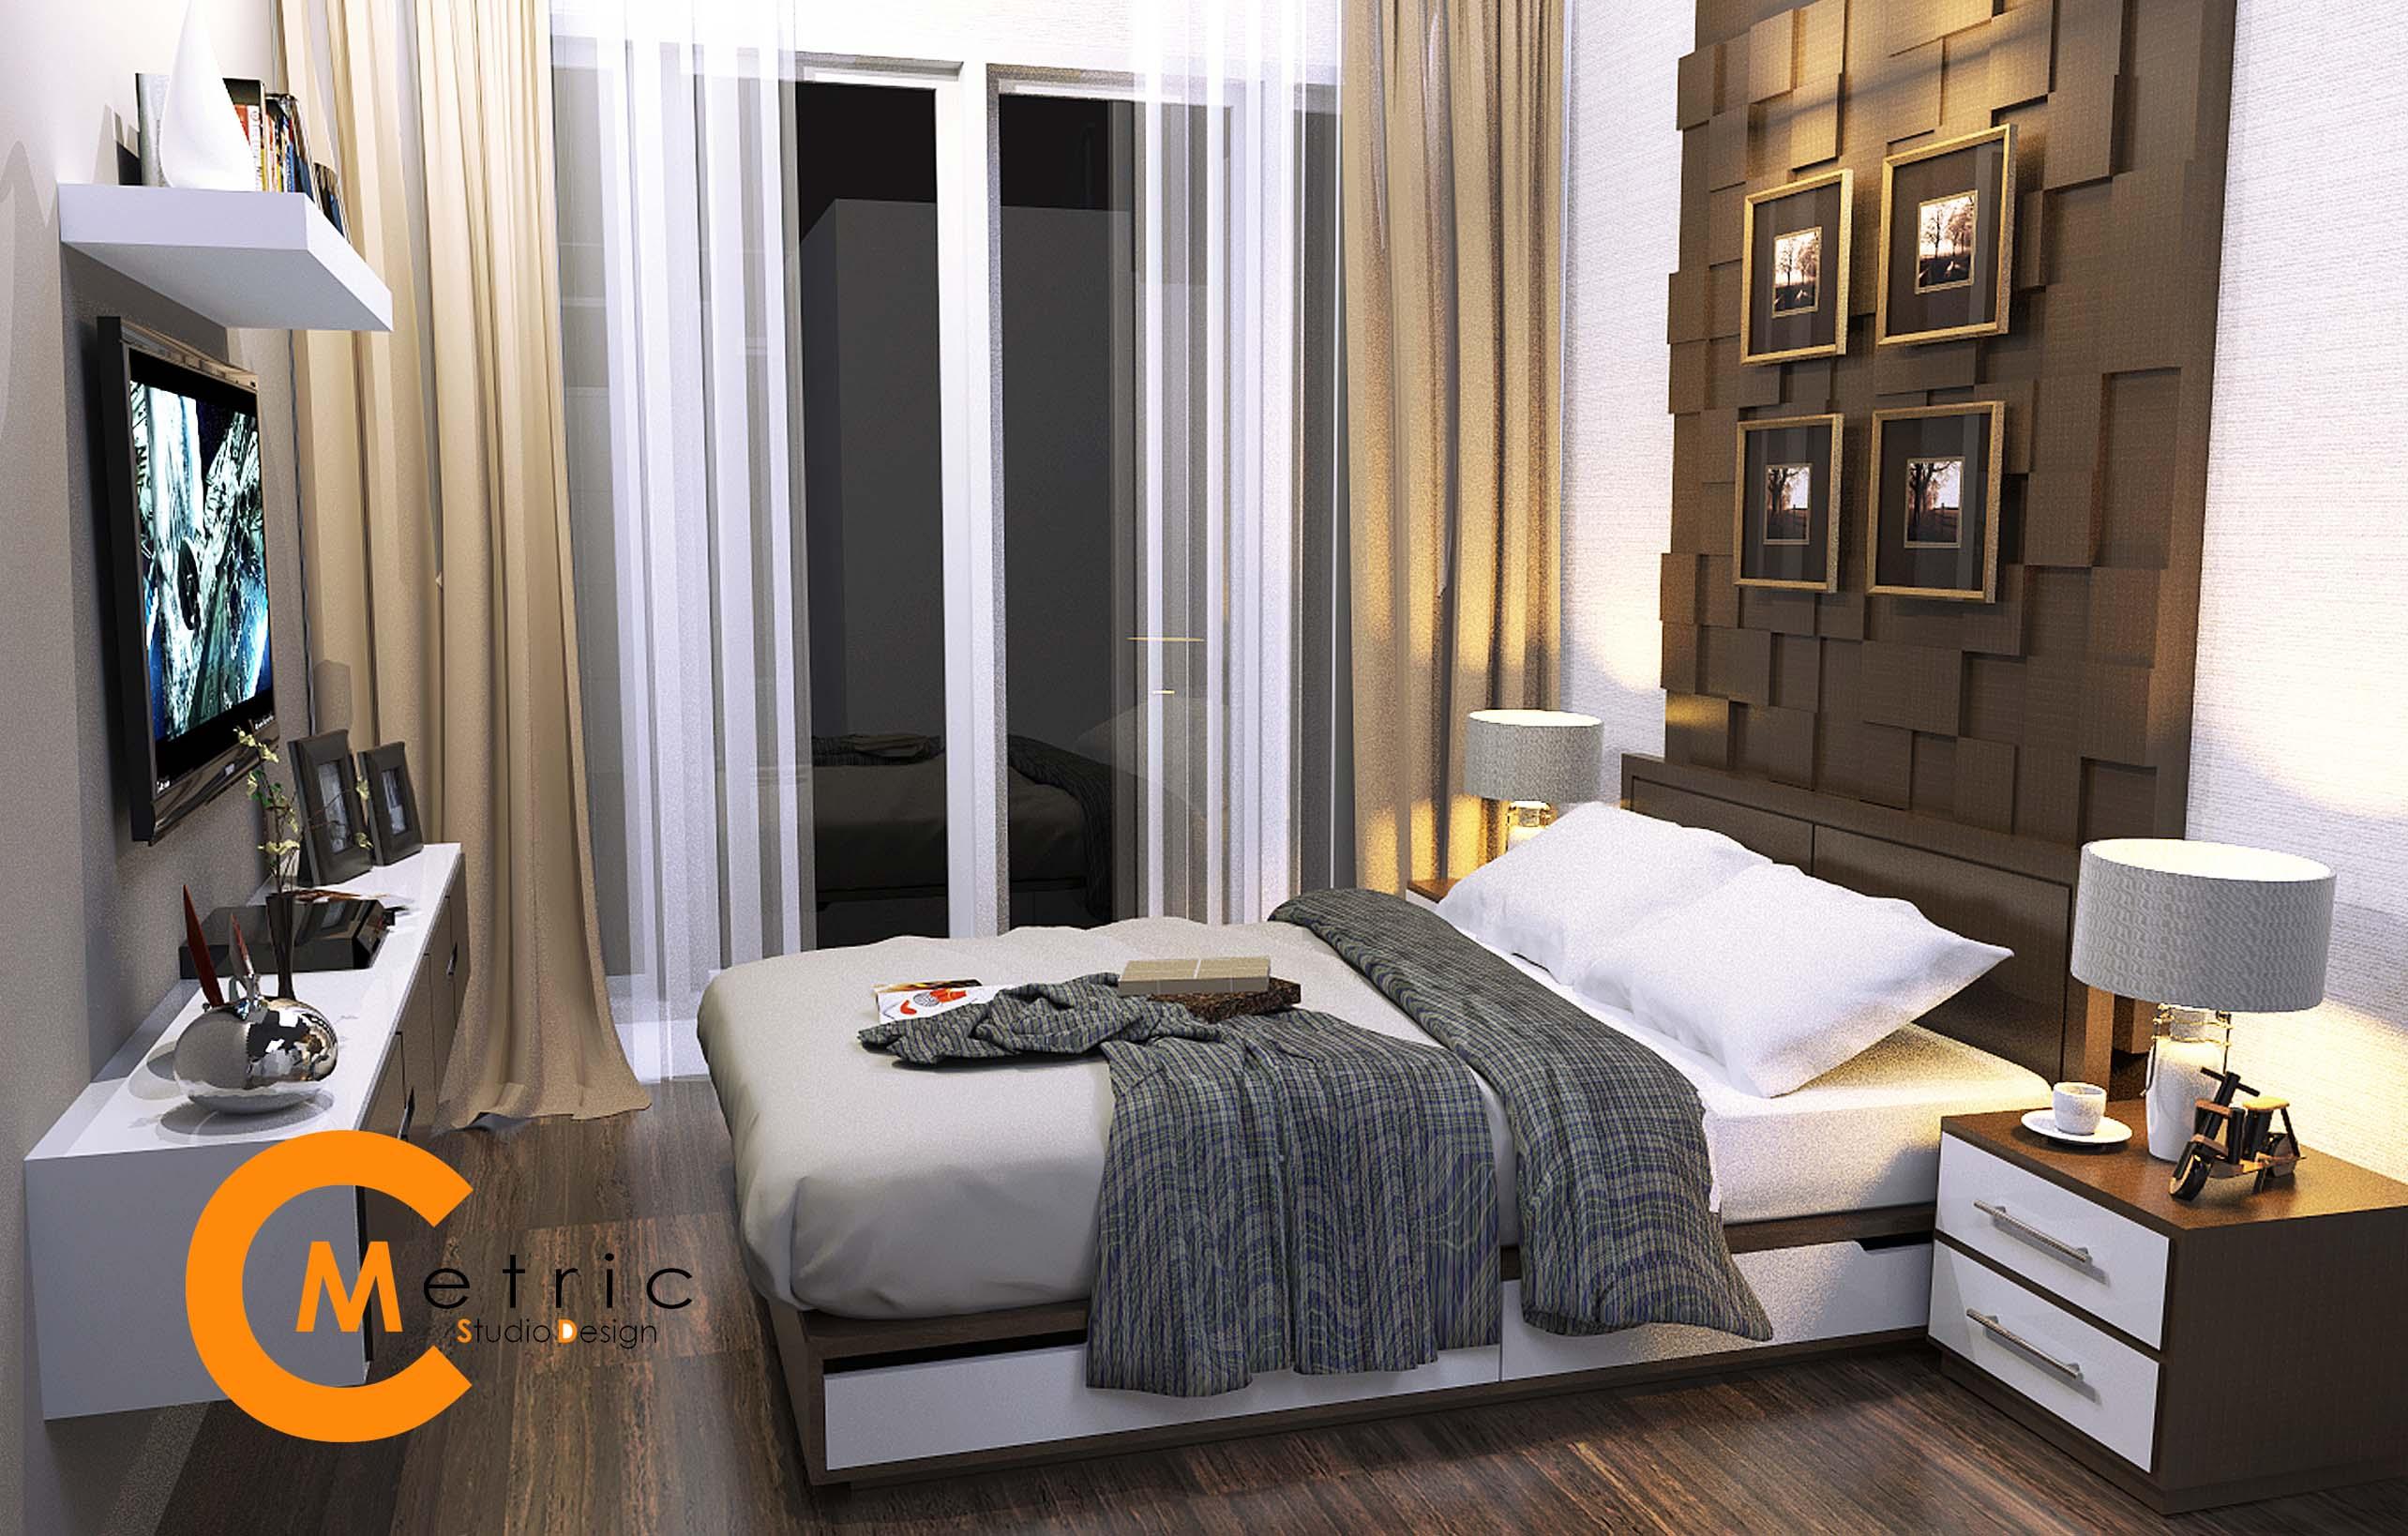 jasa gambar 3d desain interior apartemen rumah arsitektur kitchen set